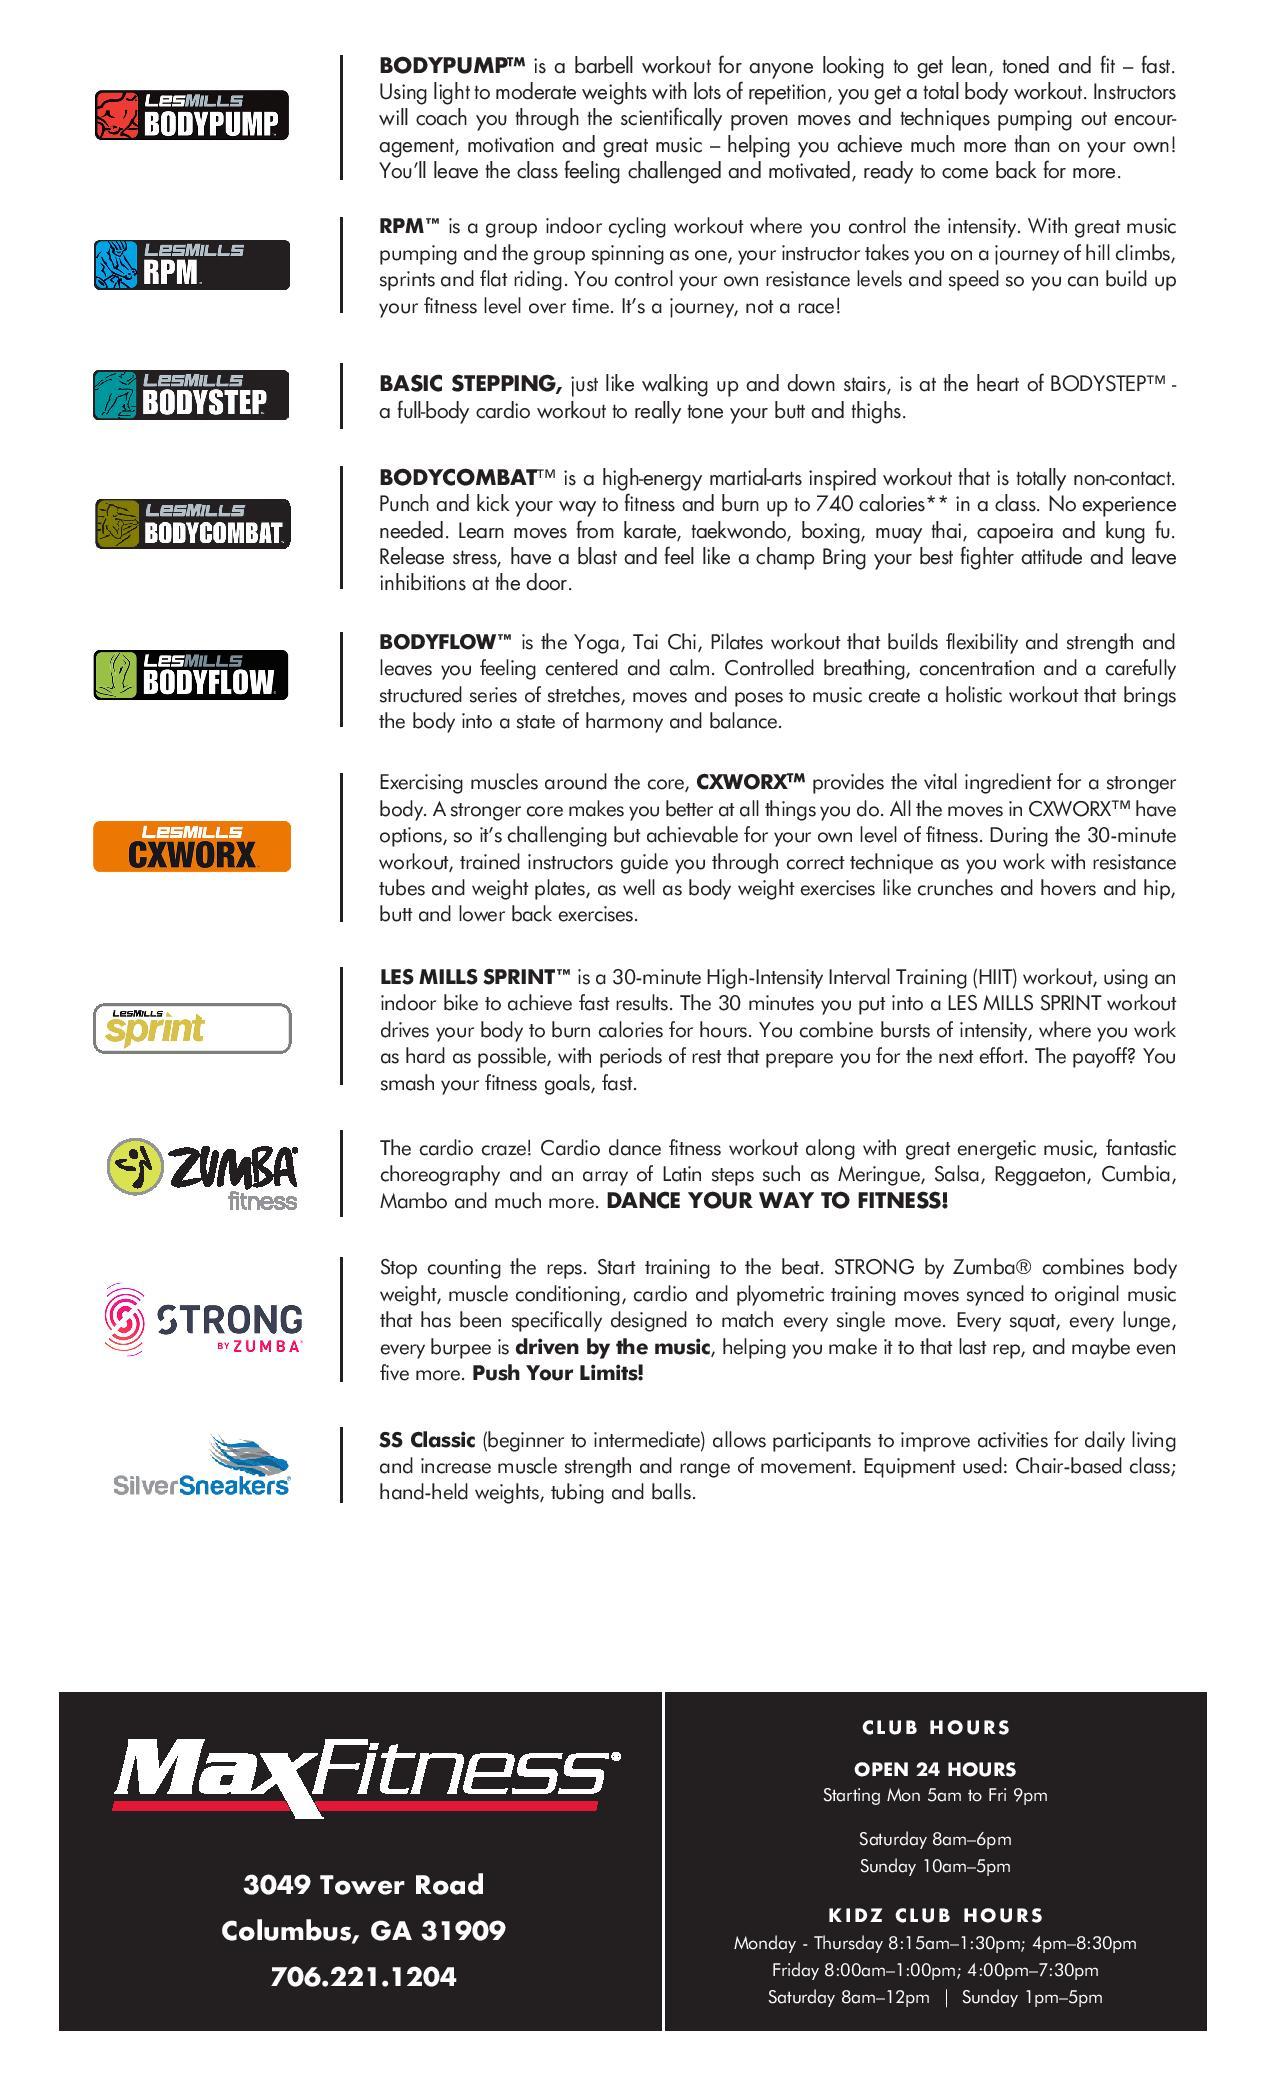 MaxFitness_GF_Schedule_July2020-page-002